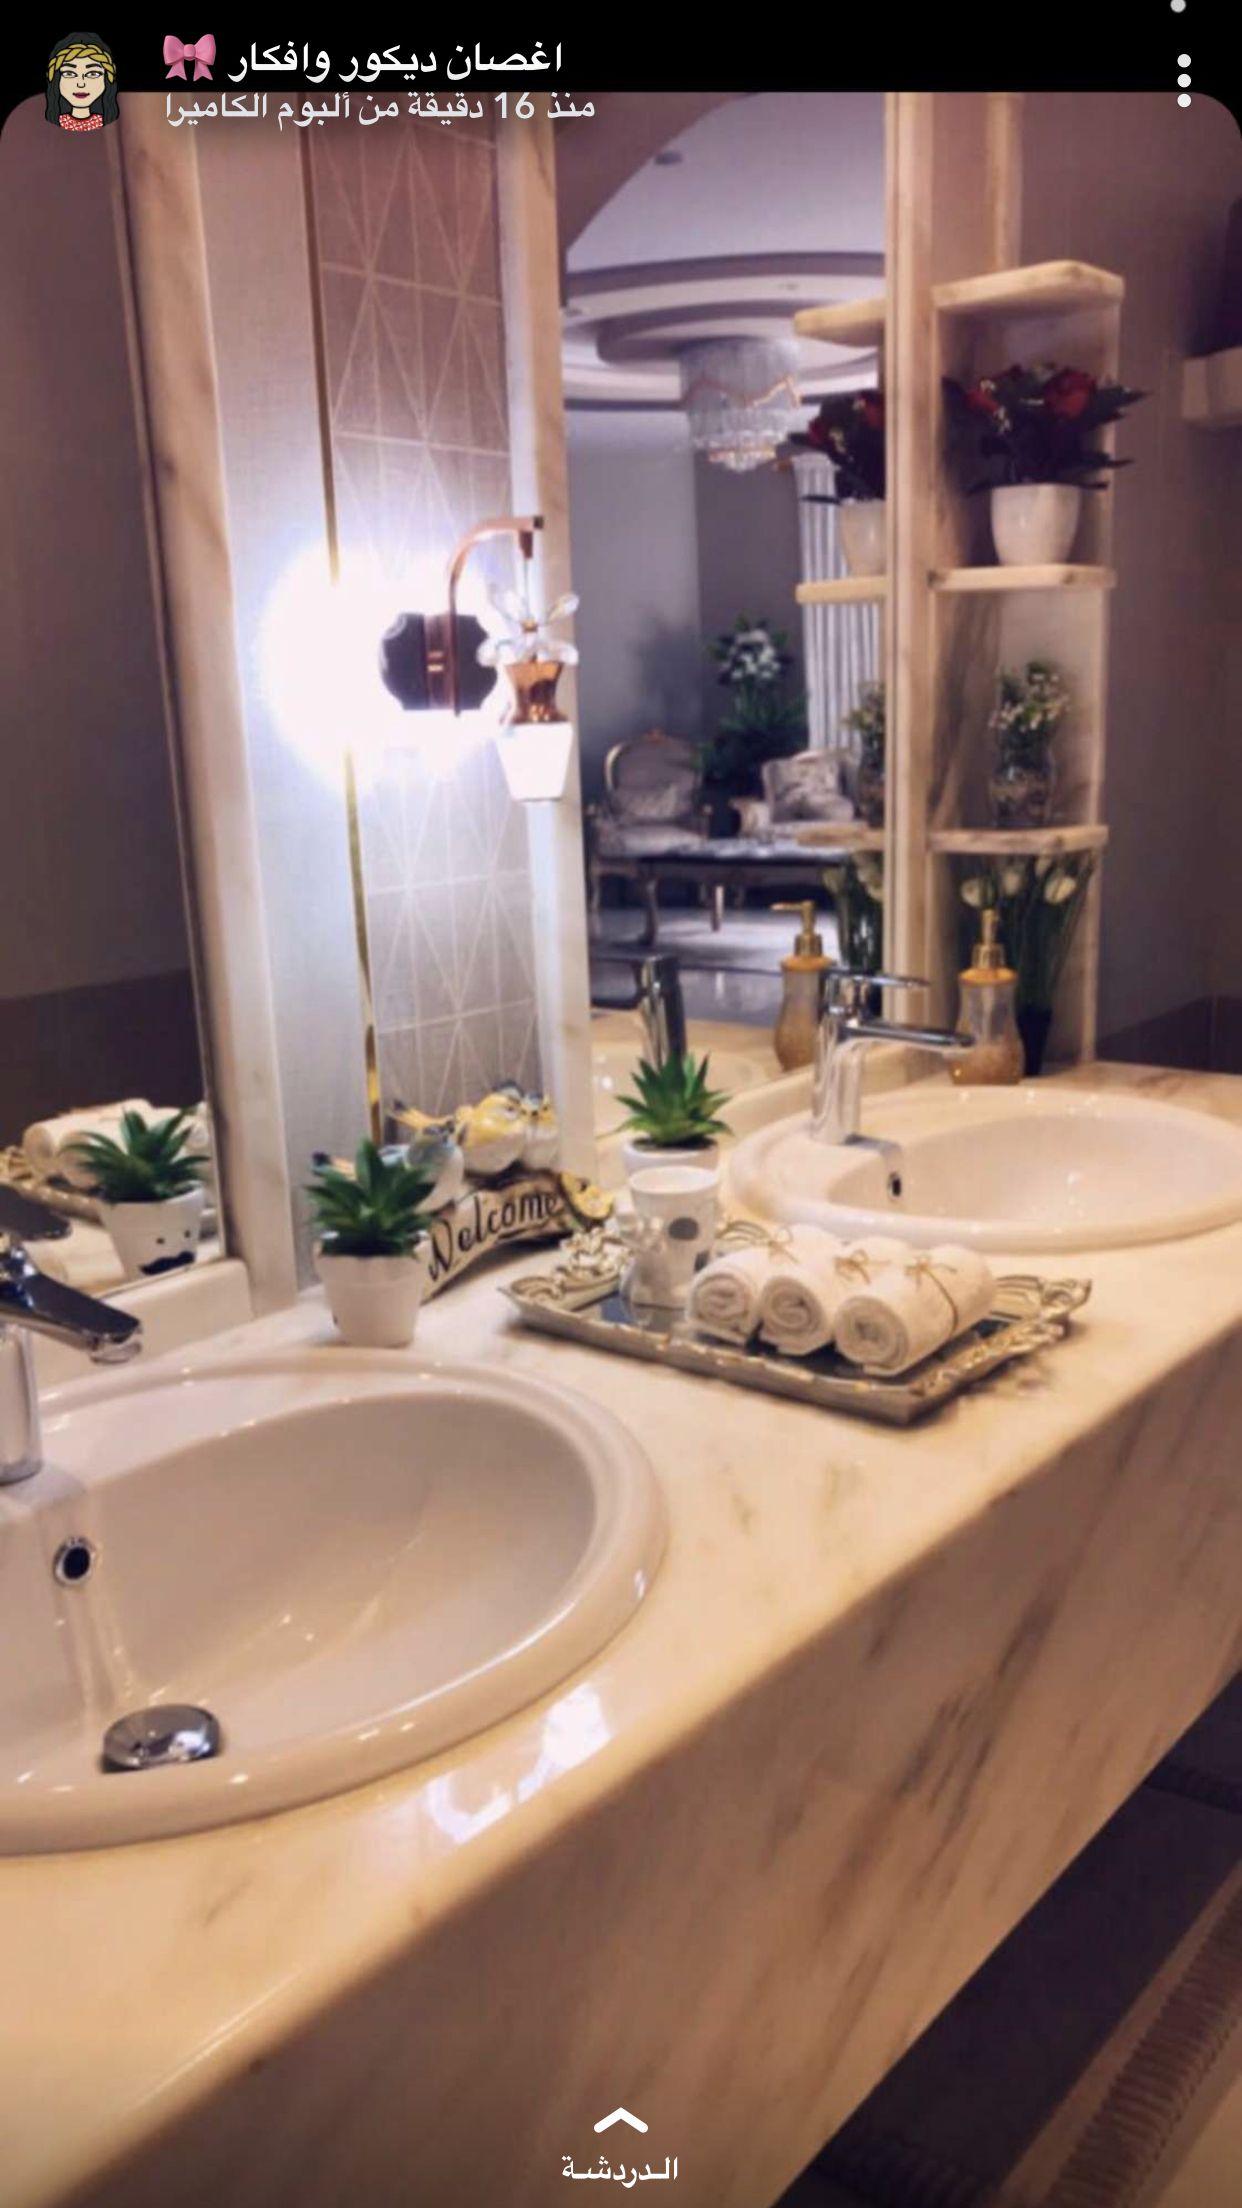 Pin By Meaad Saad On حمامات Living Room Design Decor Bathroom Decor Home Design Decor